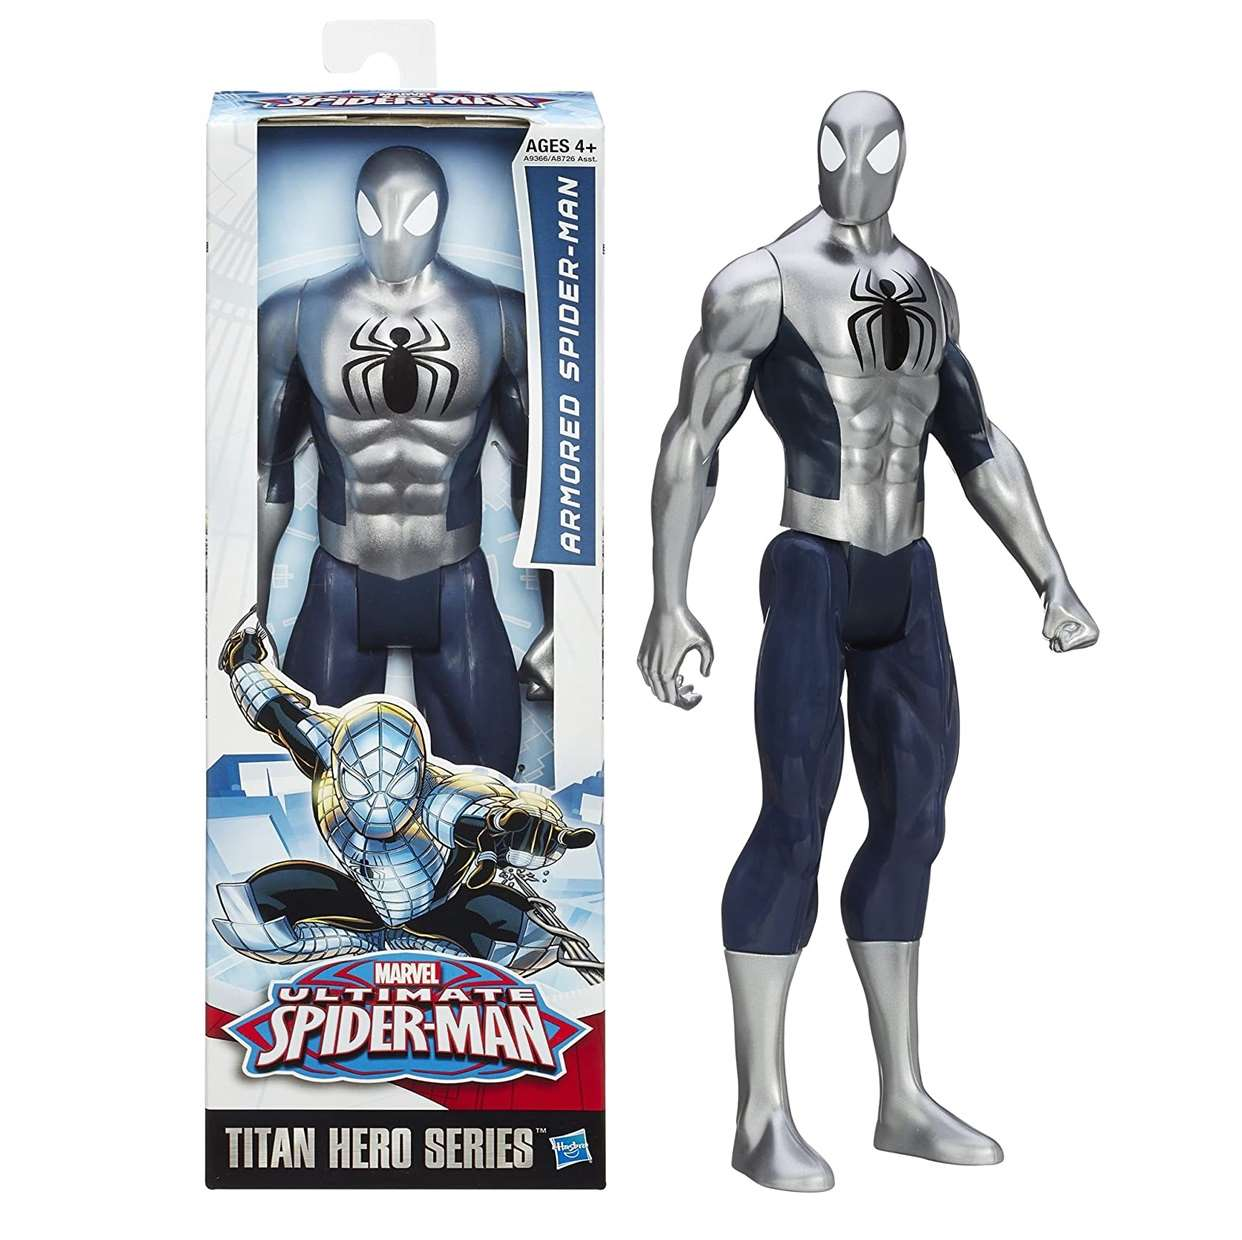 Armored Spider Man Figura Marvel Ultimate Titan Hero 12 PuLG